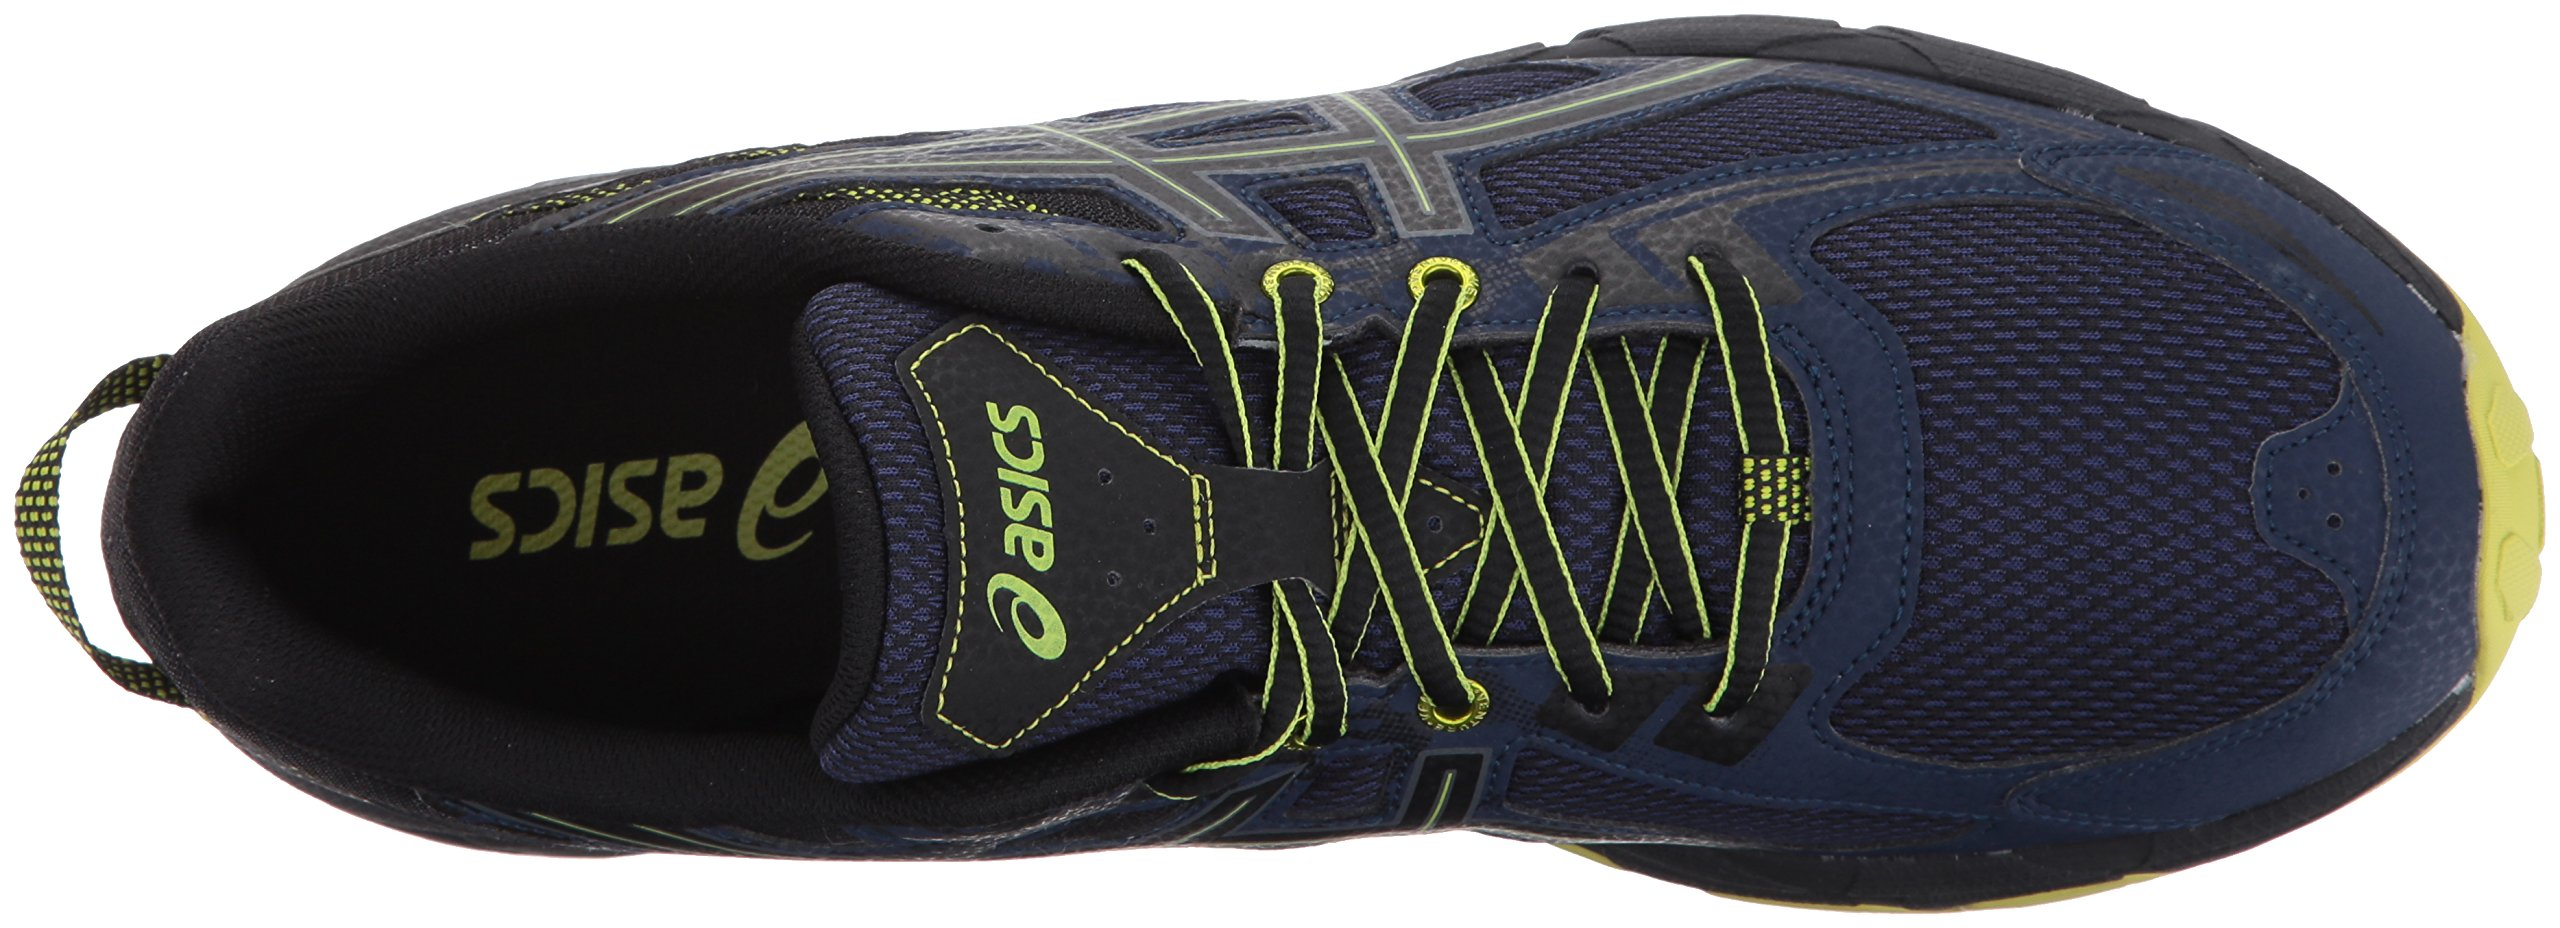 ASICS Mens Gel-Venture 6 Running Shoe, Indigo Blue/Black/Energy Green, 7 Medium US by ASICS (Image #8)